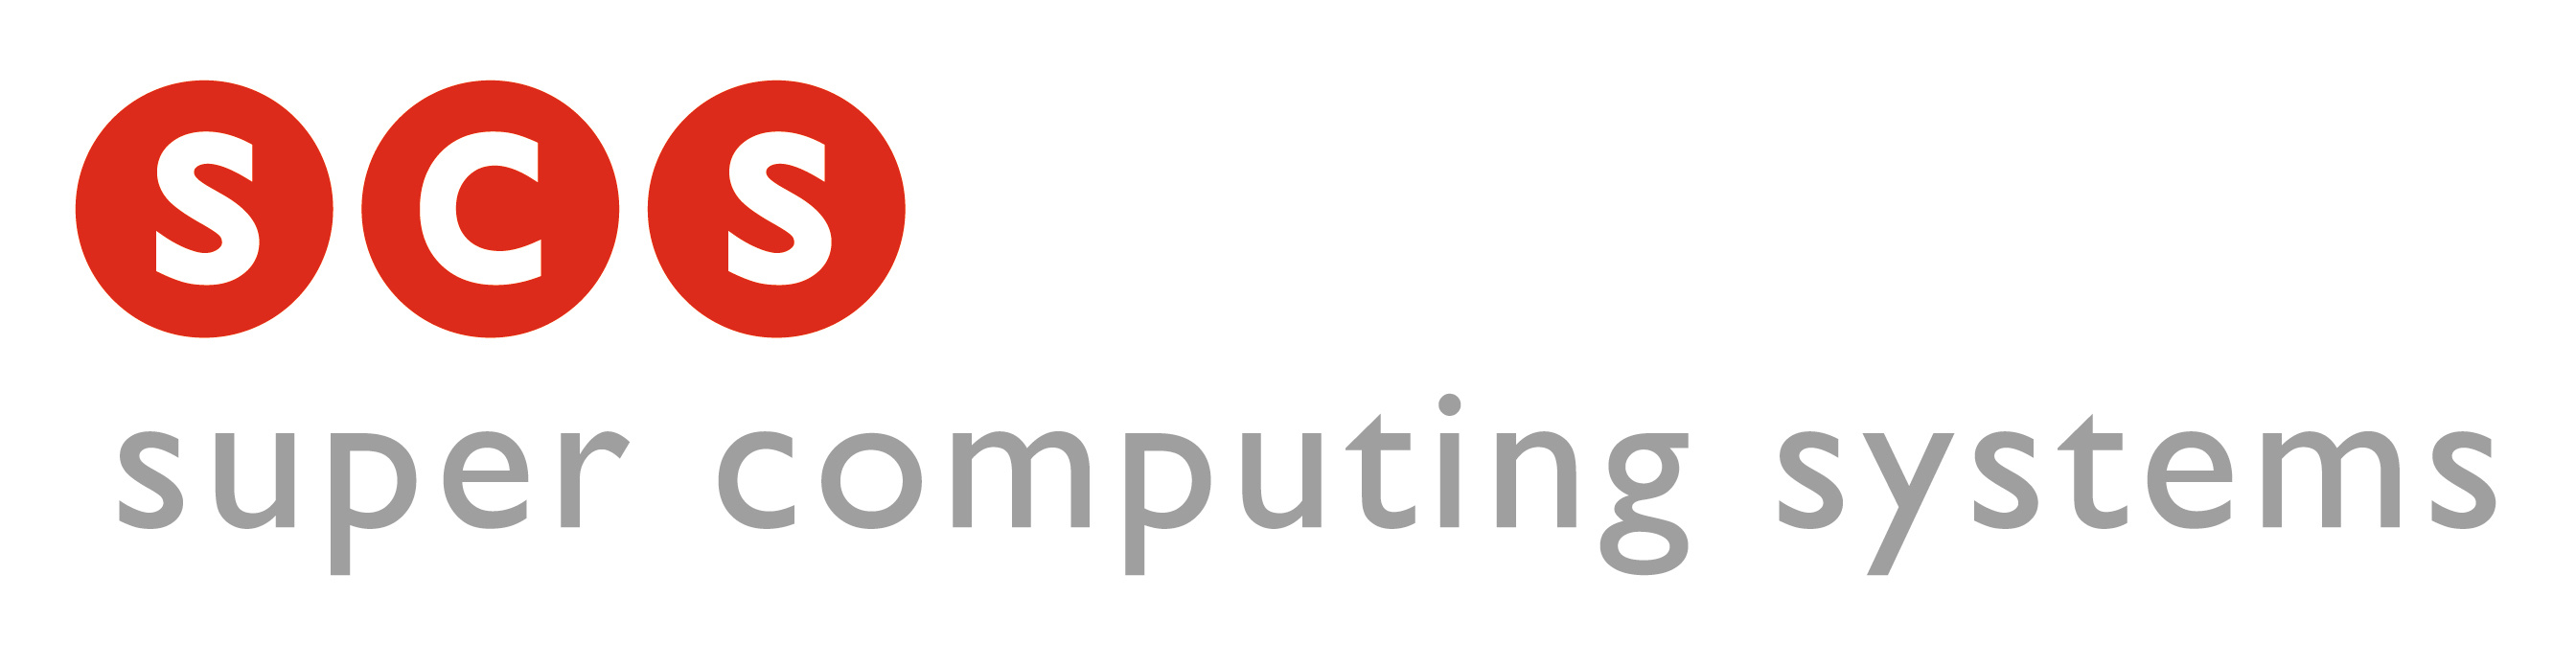 Super Computing System Logo